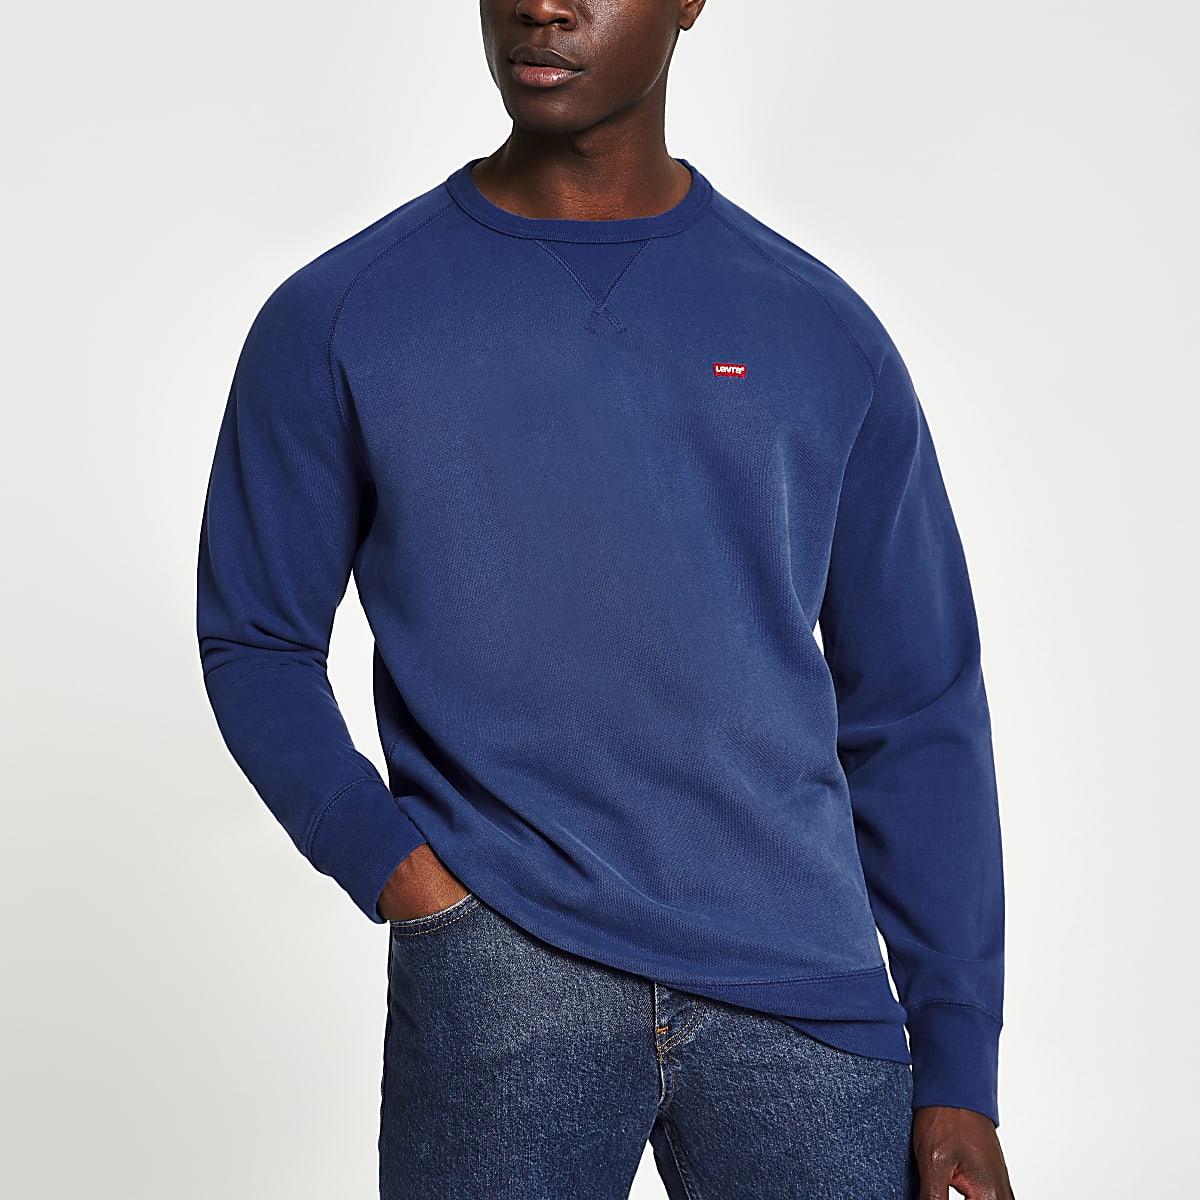 Levi's Original blue sweatshirt